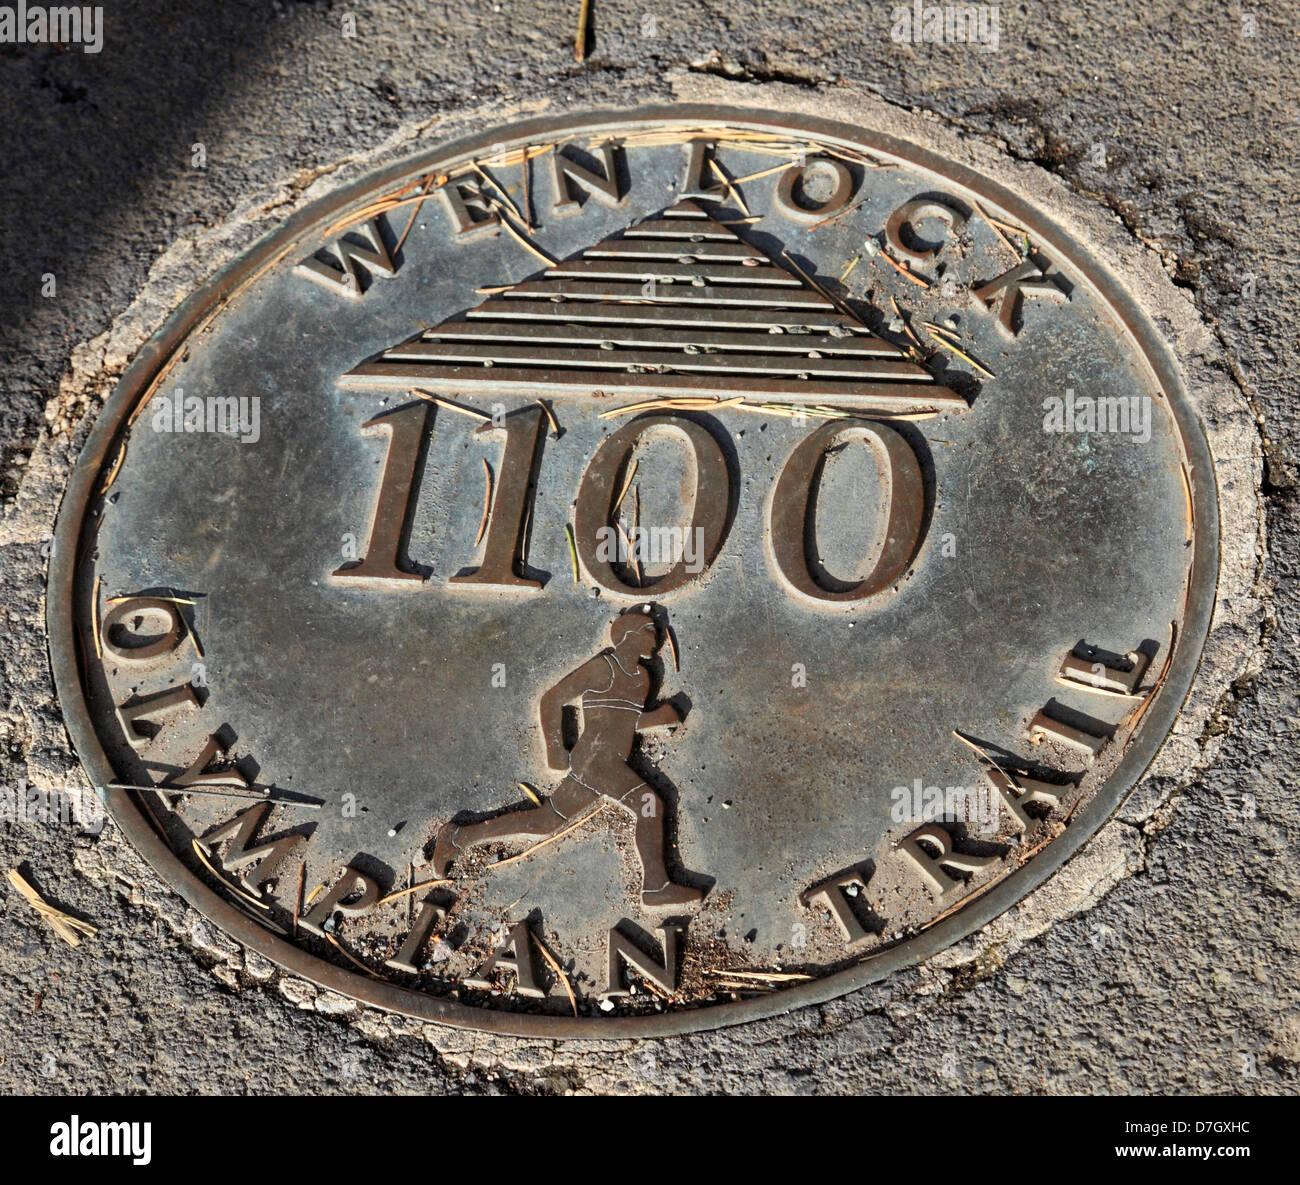 8908. Olympian Trail, Much Wenlock, Shropshire, England, UK - Stock Image